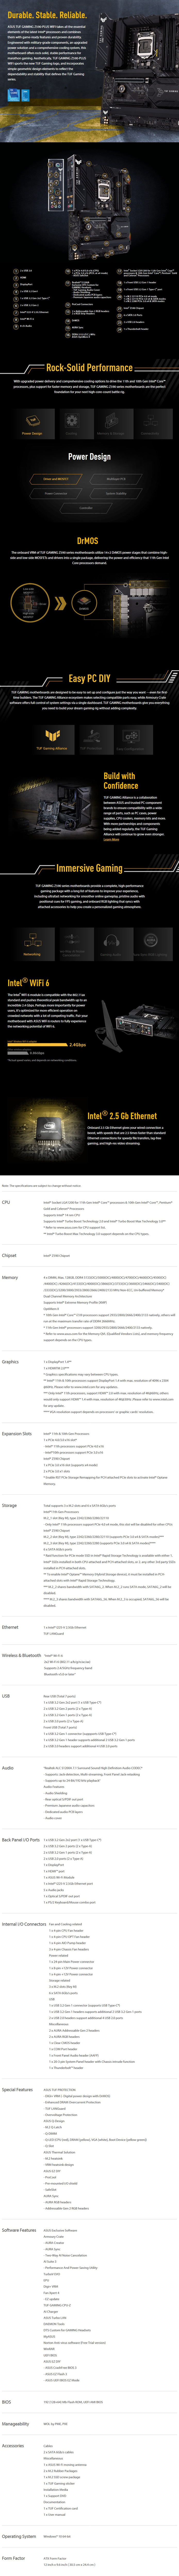 ASUS TUF GAMING Z590-PLUS WIFI LGA 1200 ATX Motherboard - Overview 1